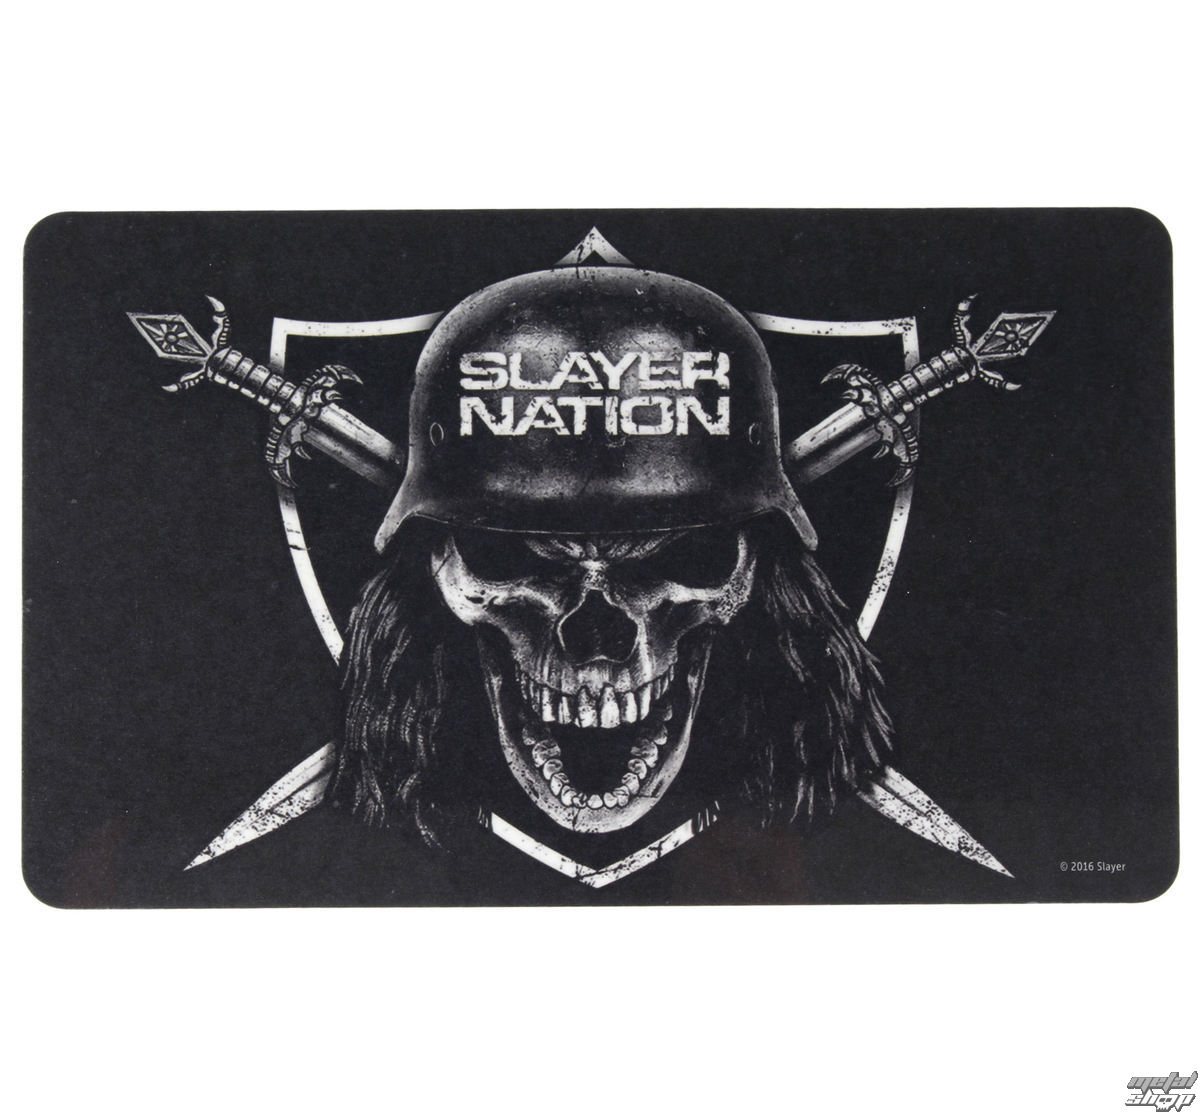 prestieranie Slayer - Nation - BFBSL2